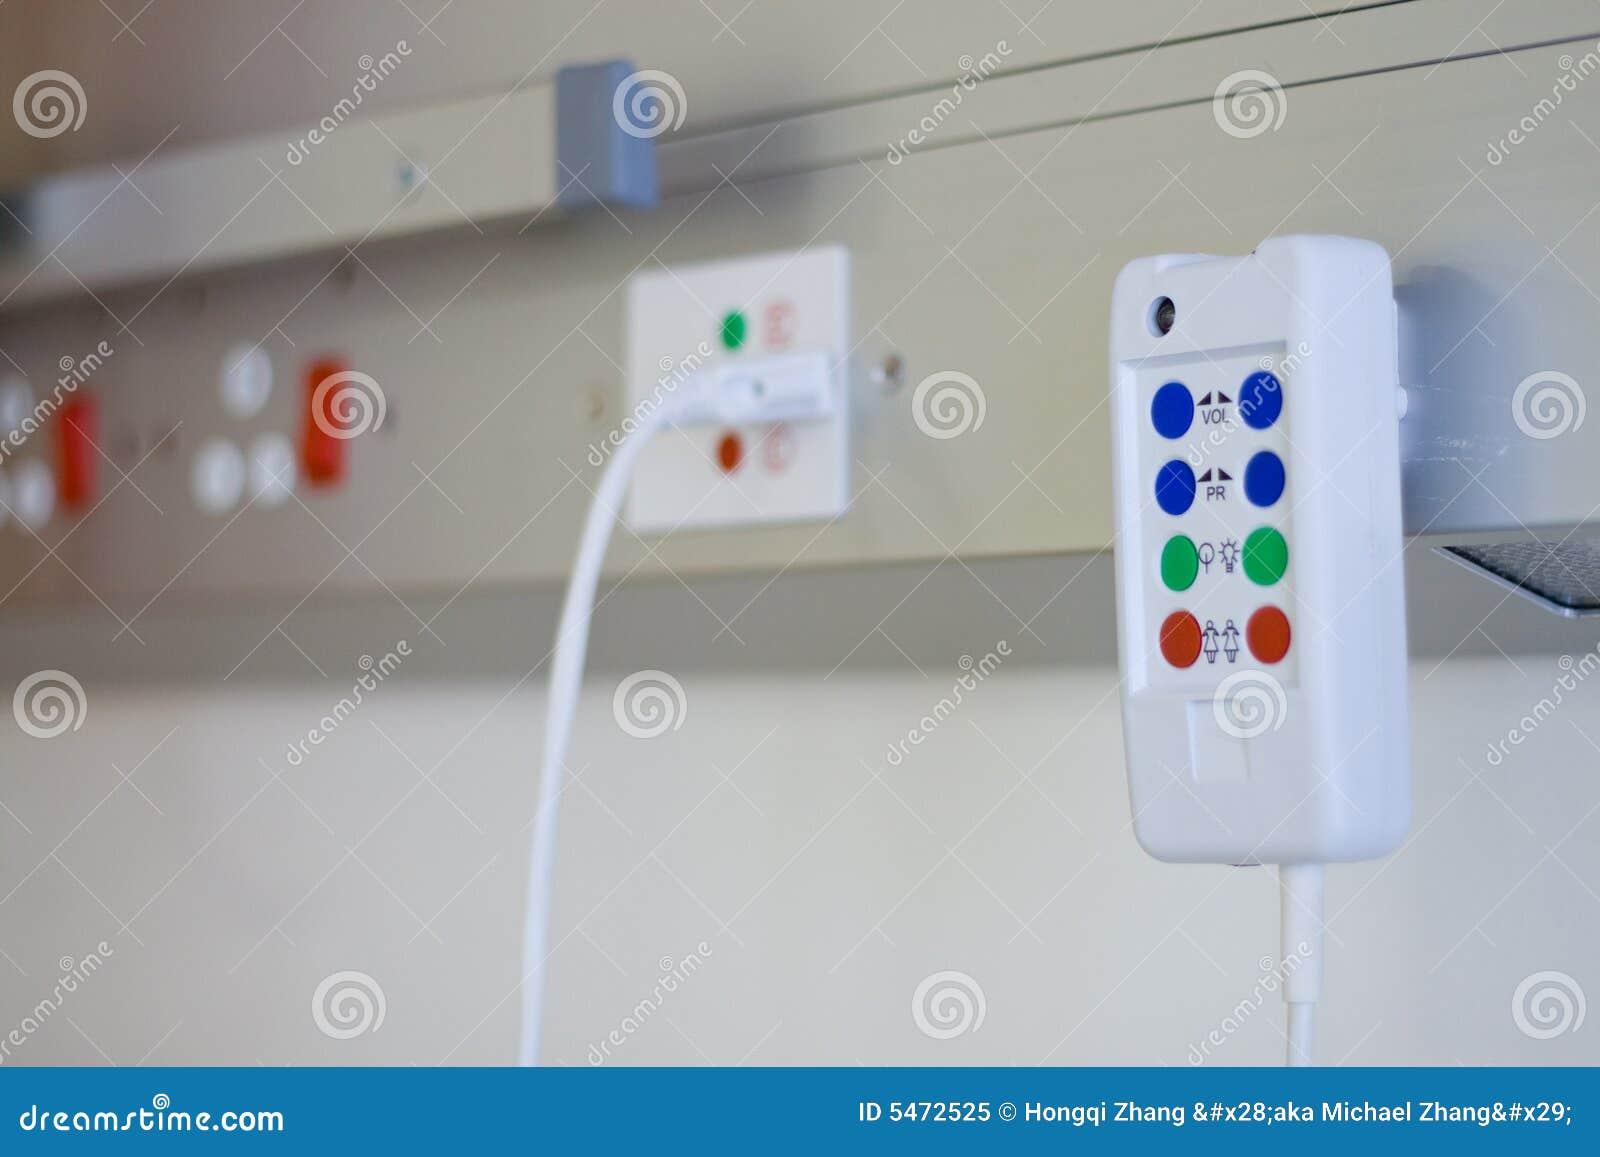 Nurse Call Button Royalty Free Stock Photo Image 5472525